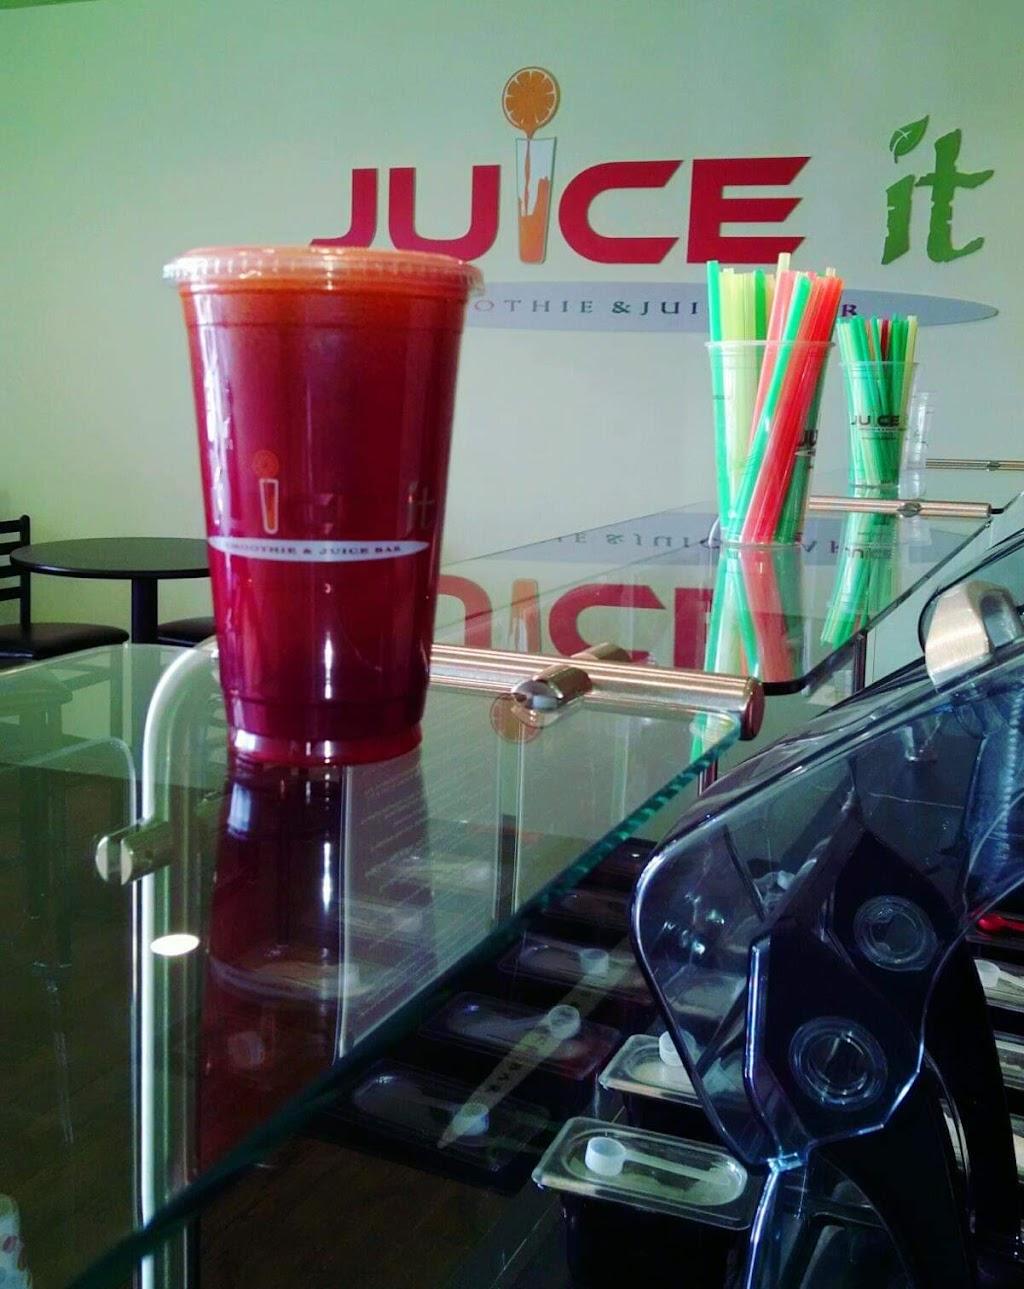 Juice It Smoothie & Juice Bar   restaurant   3842 Kennett Pike, Greenville, DE 19807, USA   3025759079 OR +1 302-575-9079